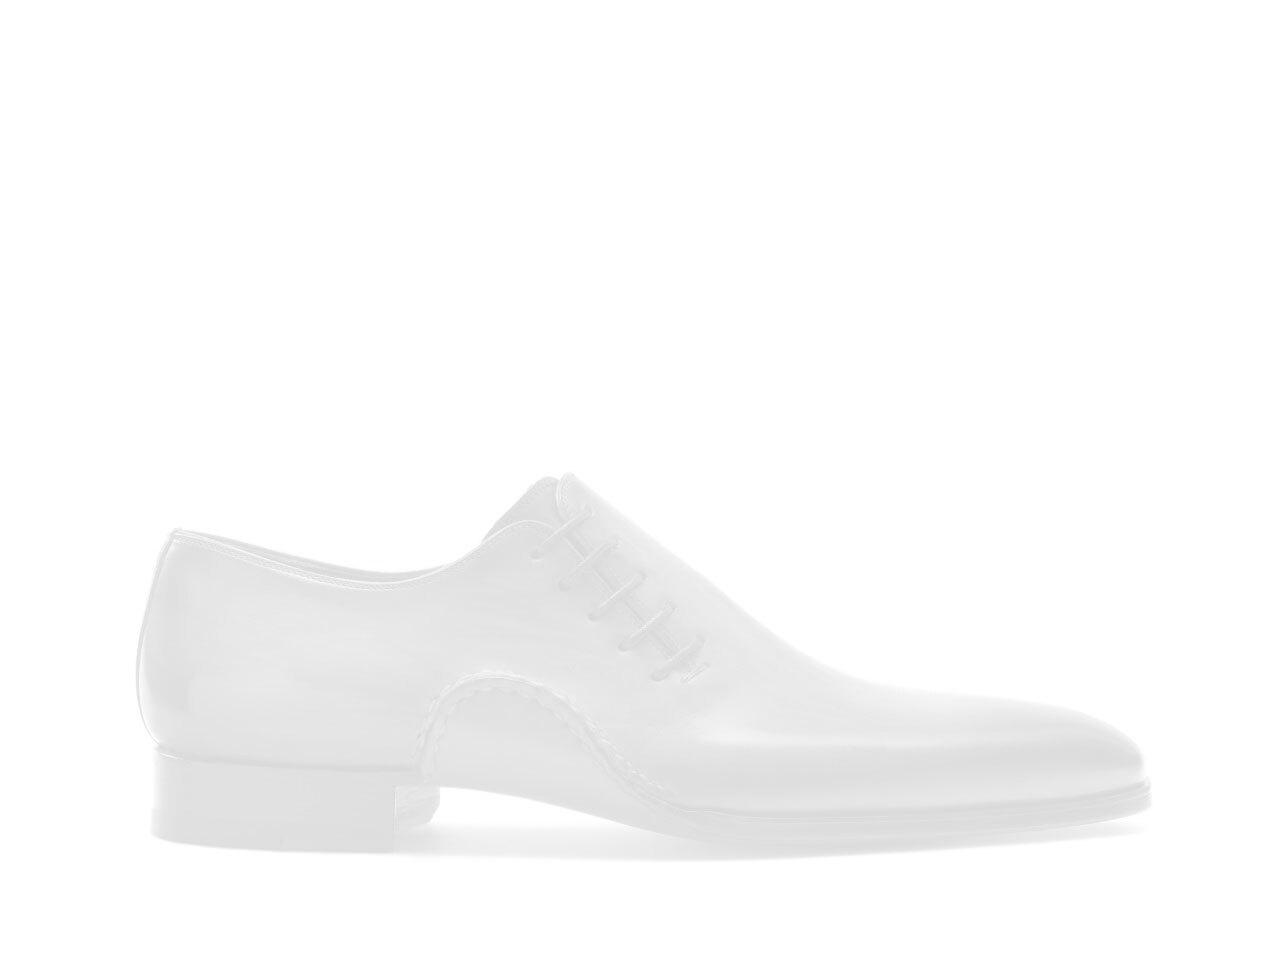 Sole of the Magnanni Efren Black Men's Single Monk Strap Shoes